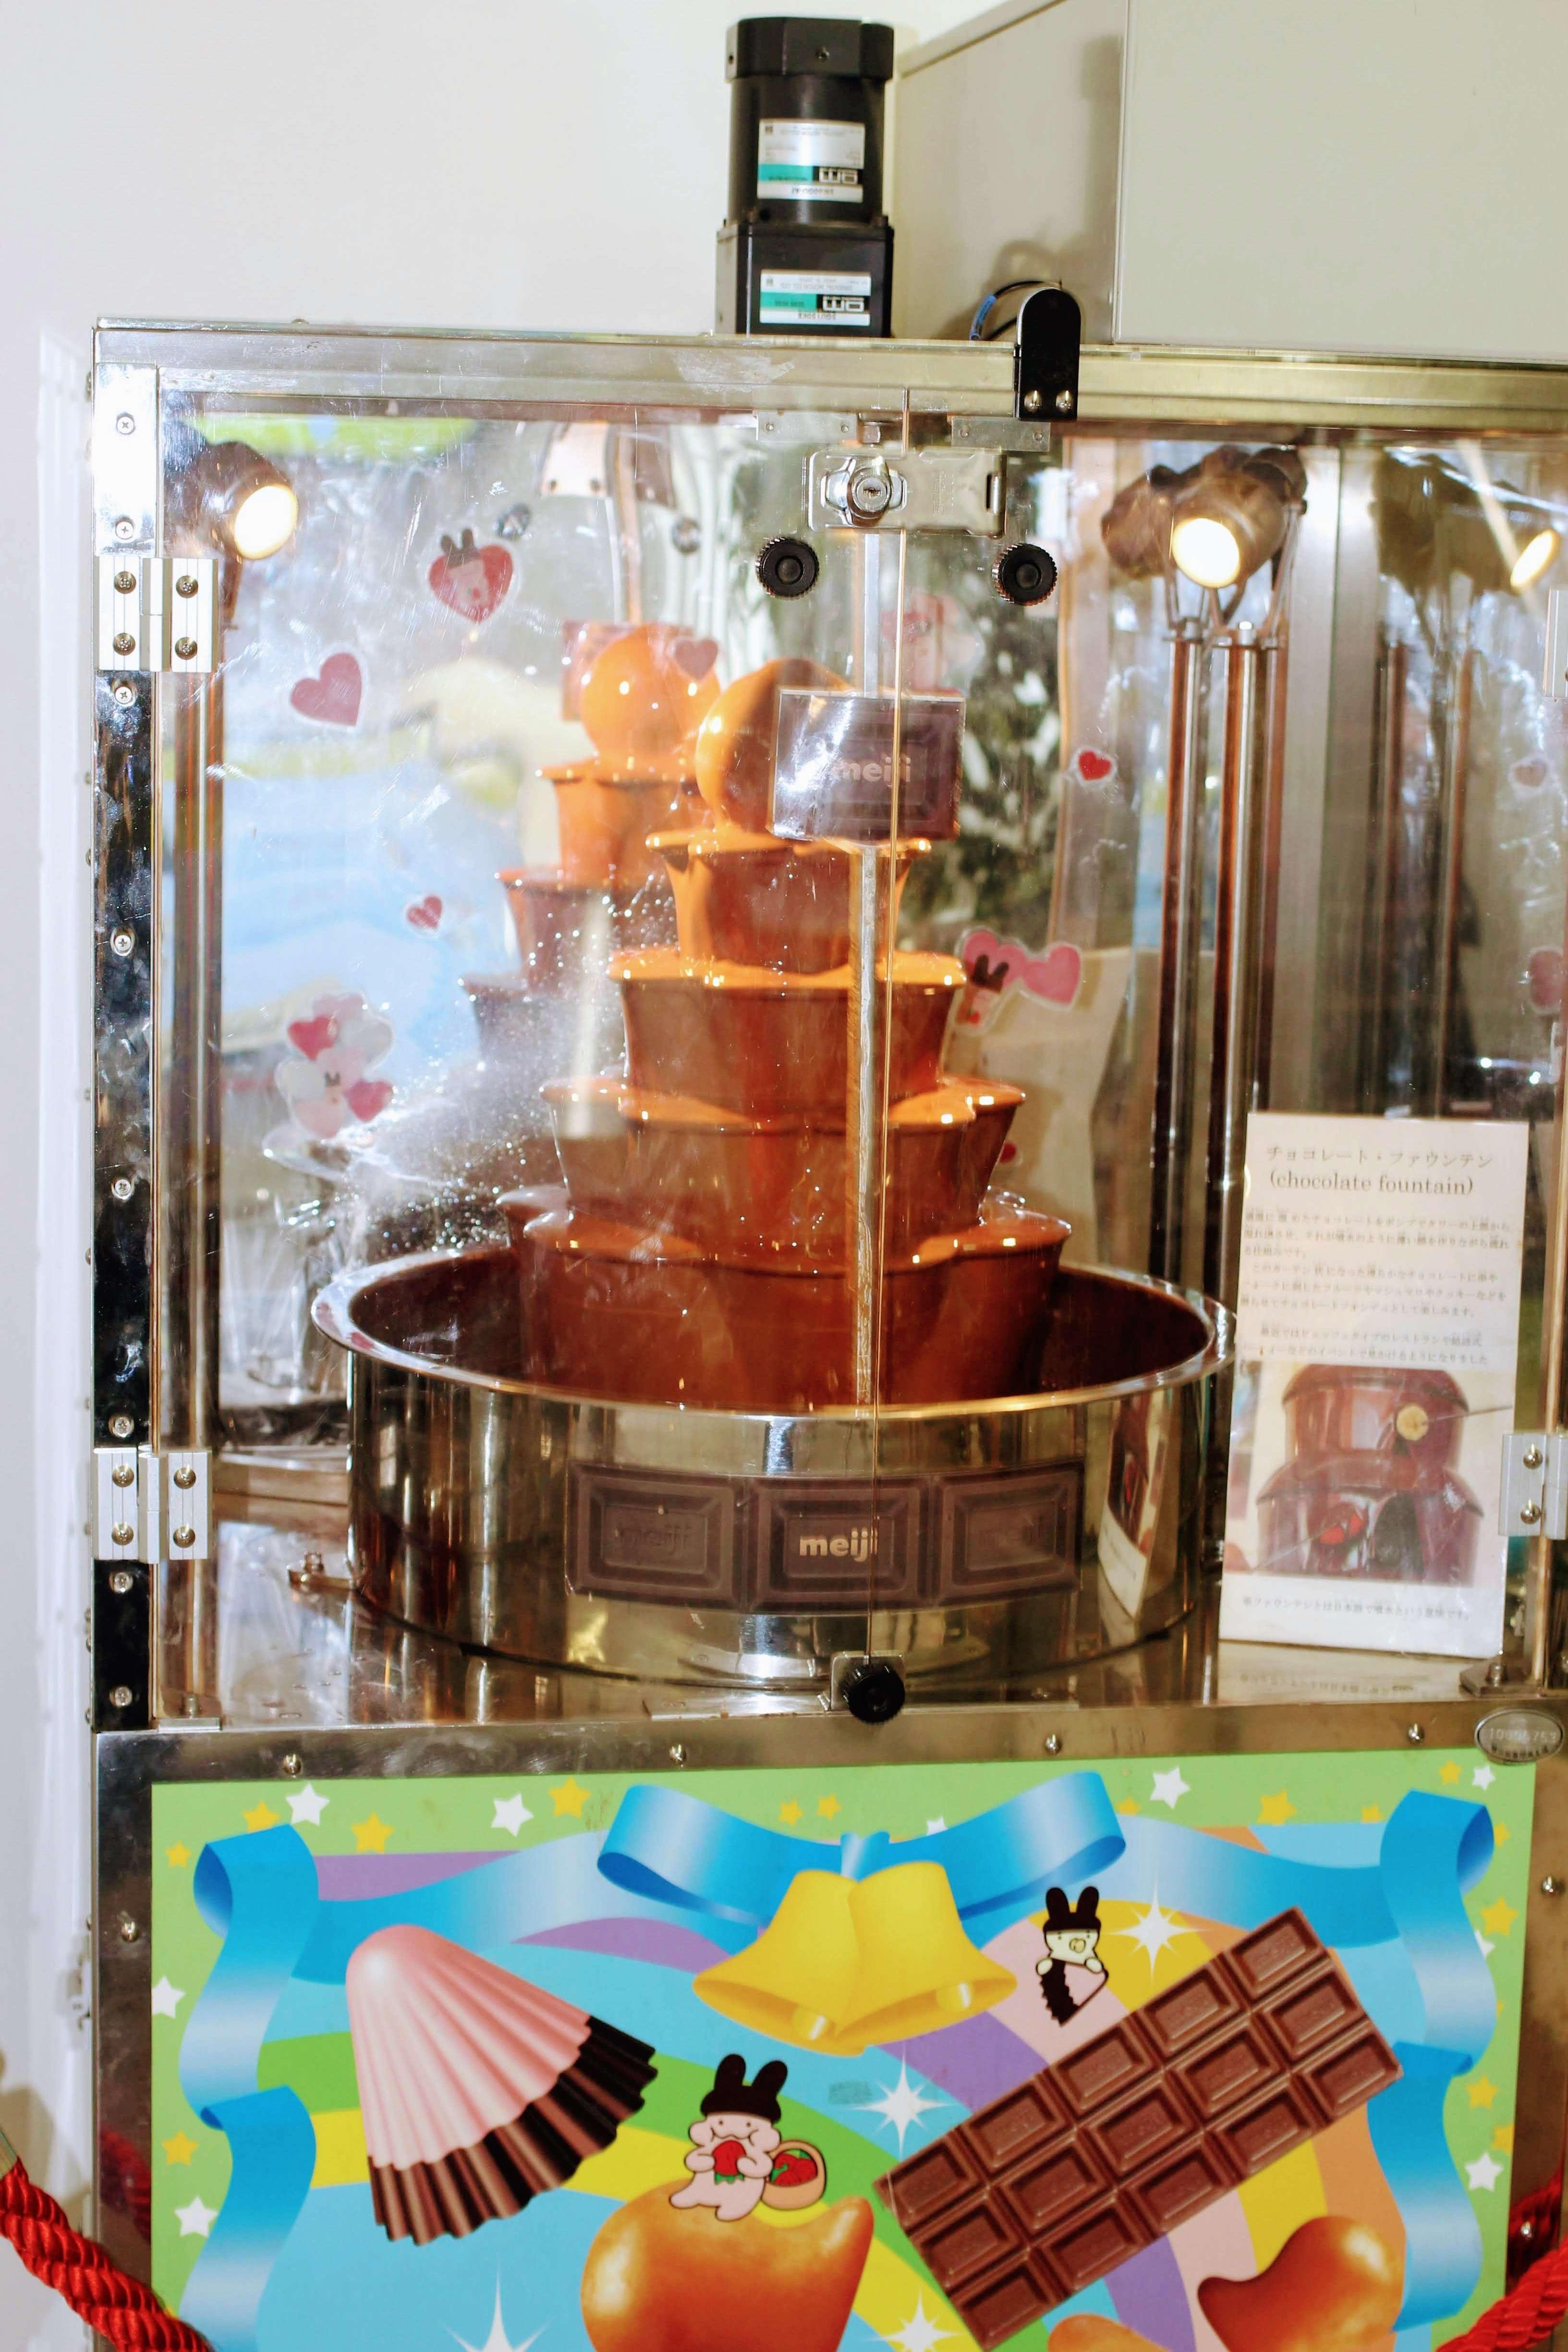 Meiji Chocolate fountain